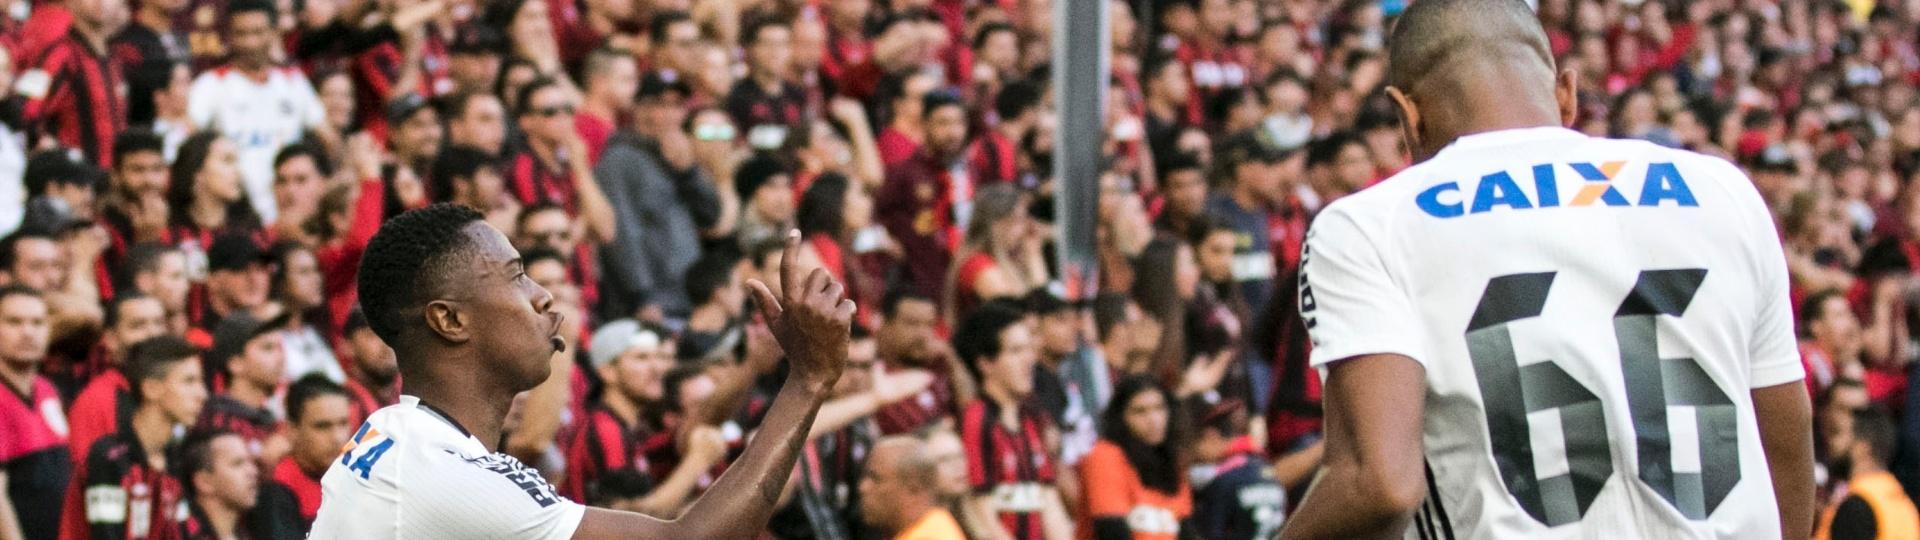 Iago comemora gol do Coritiba contra o Atlético-PR na Arena da Baixada